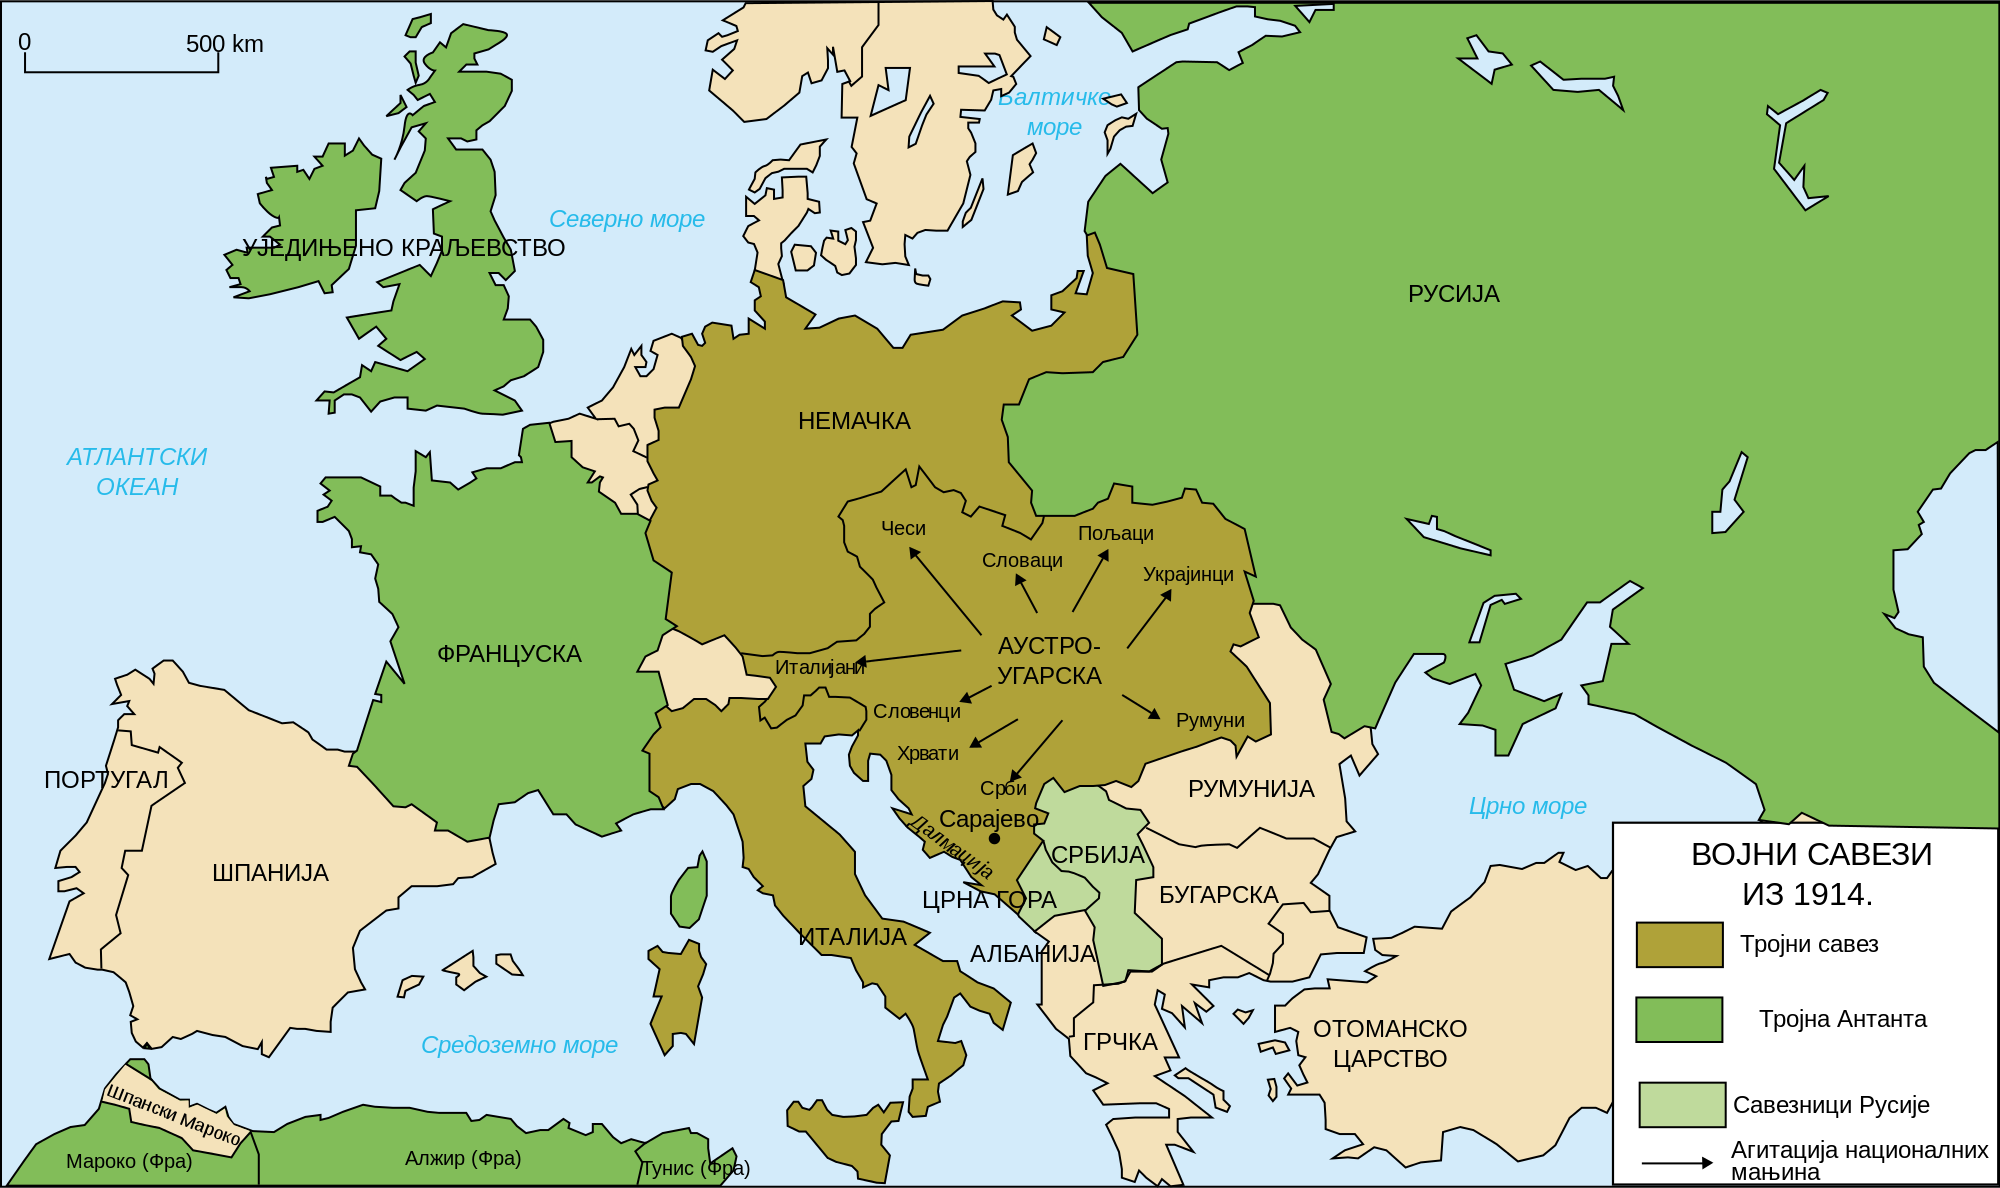 karta evrope posle prvog svetskog rata STO GODINA OD VELIKOG RATA karta evrope posle prvog svetskog rata